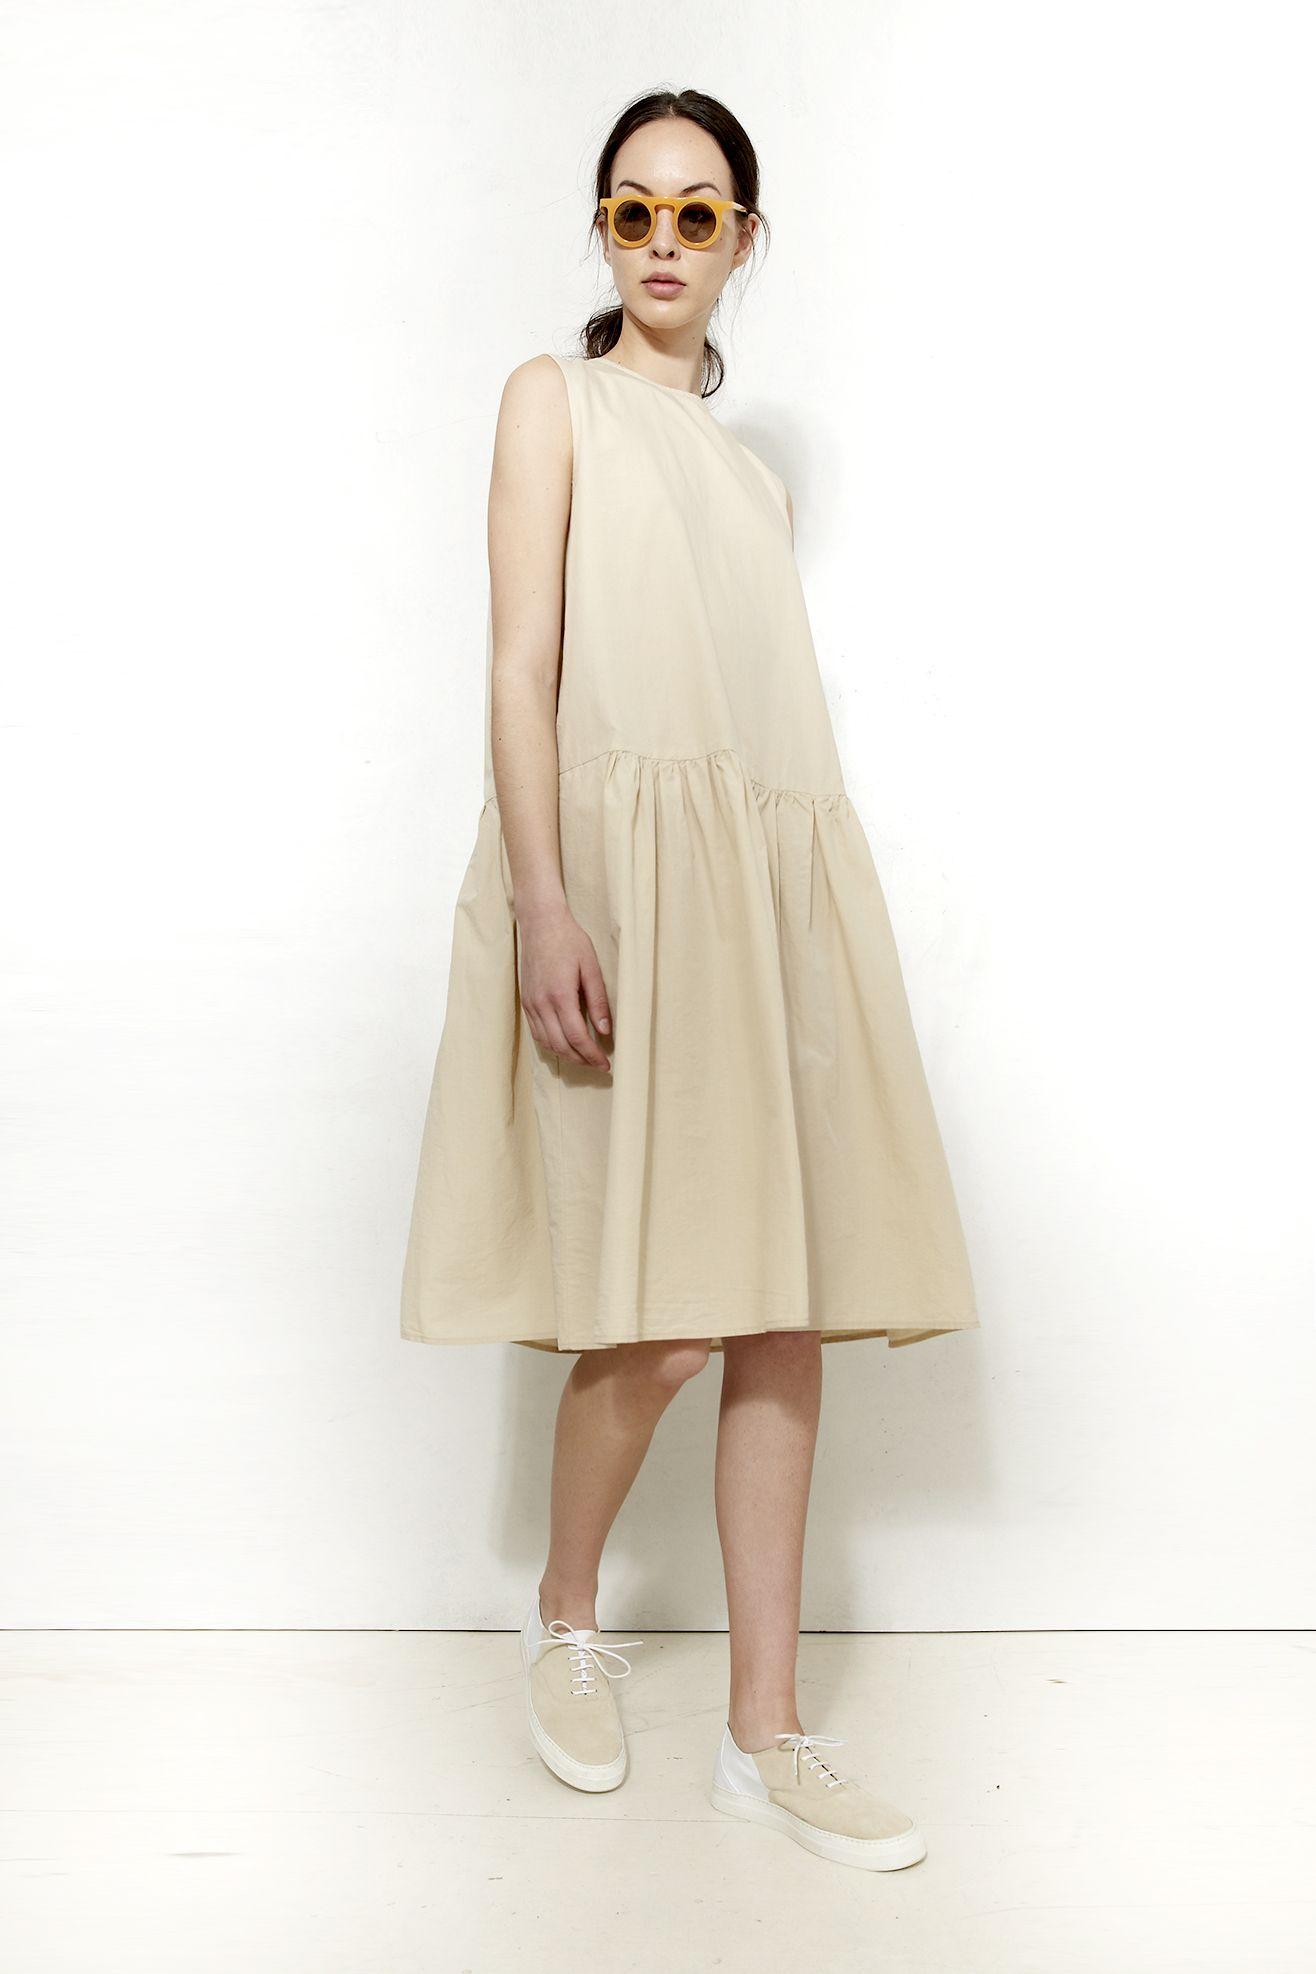 APUNTOB Tank Dress My Style Pinboard Pinterest Tank dress